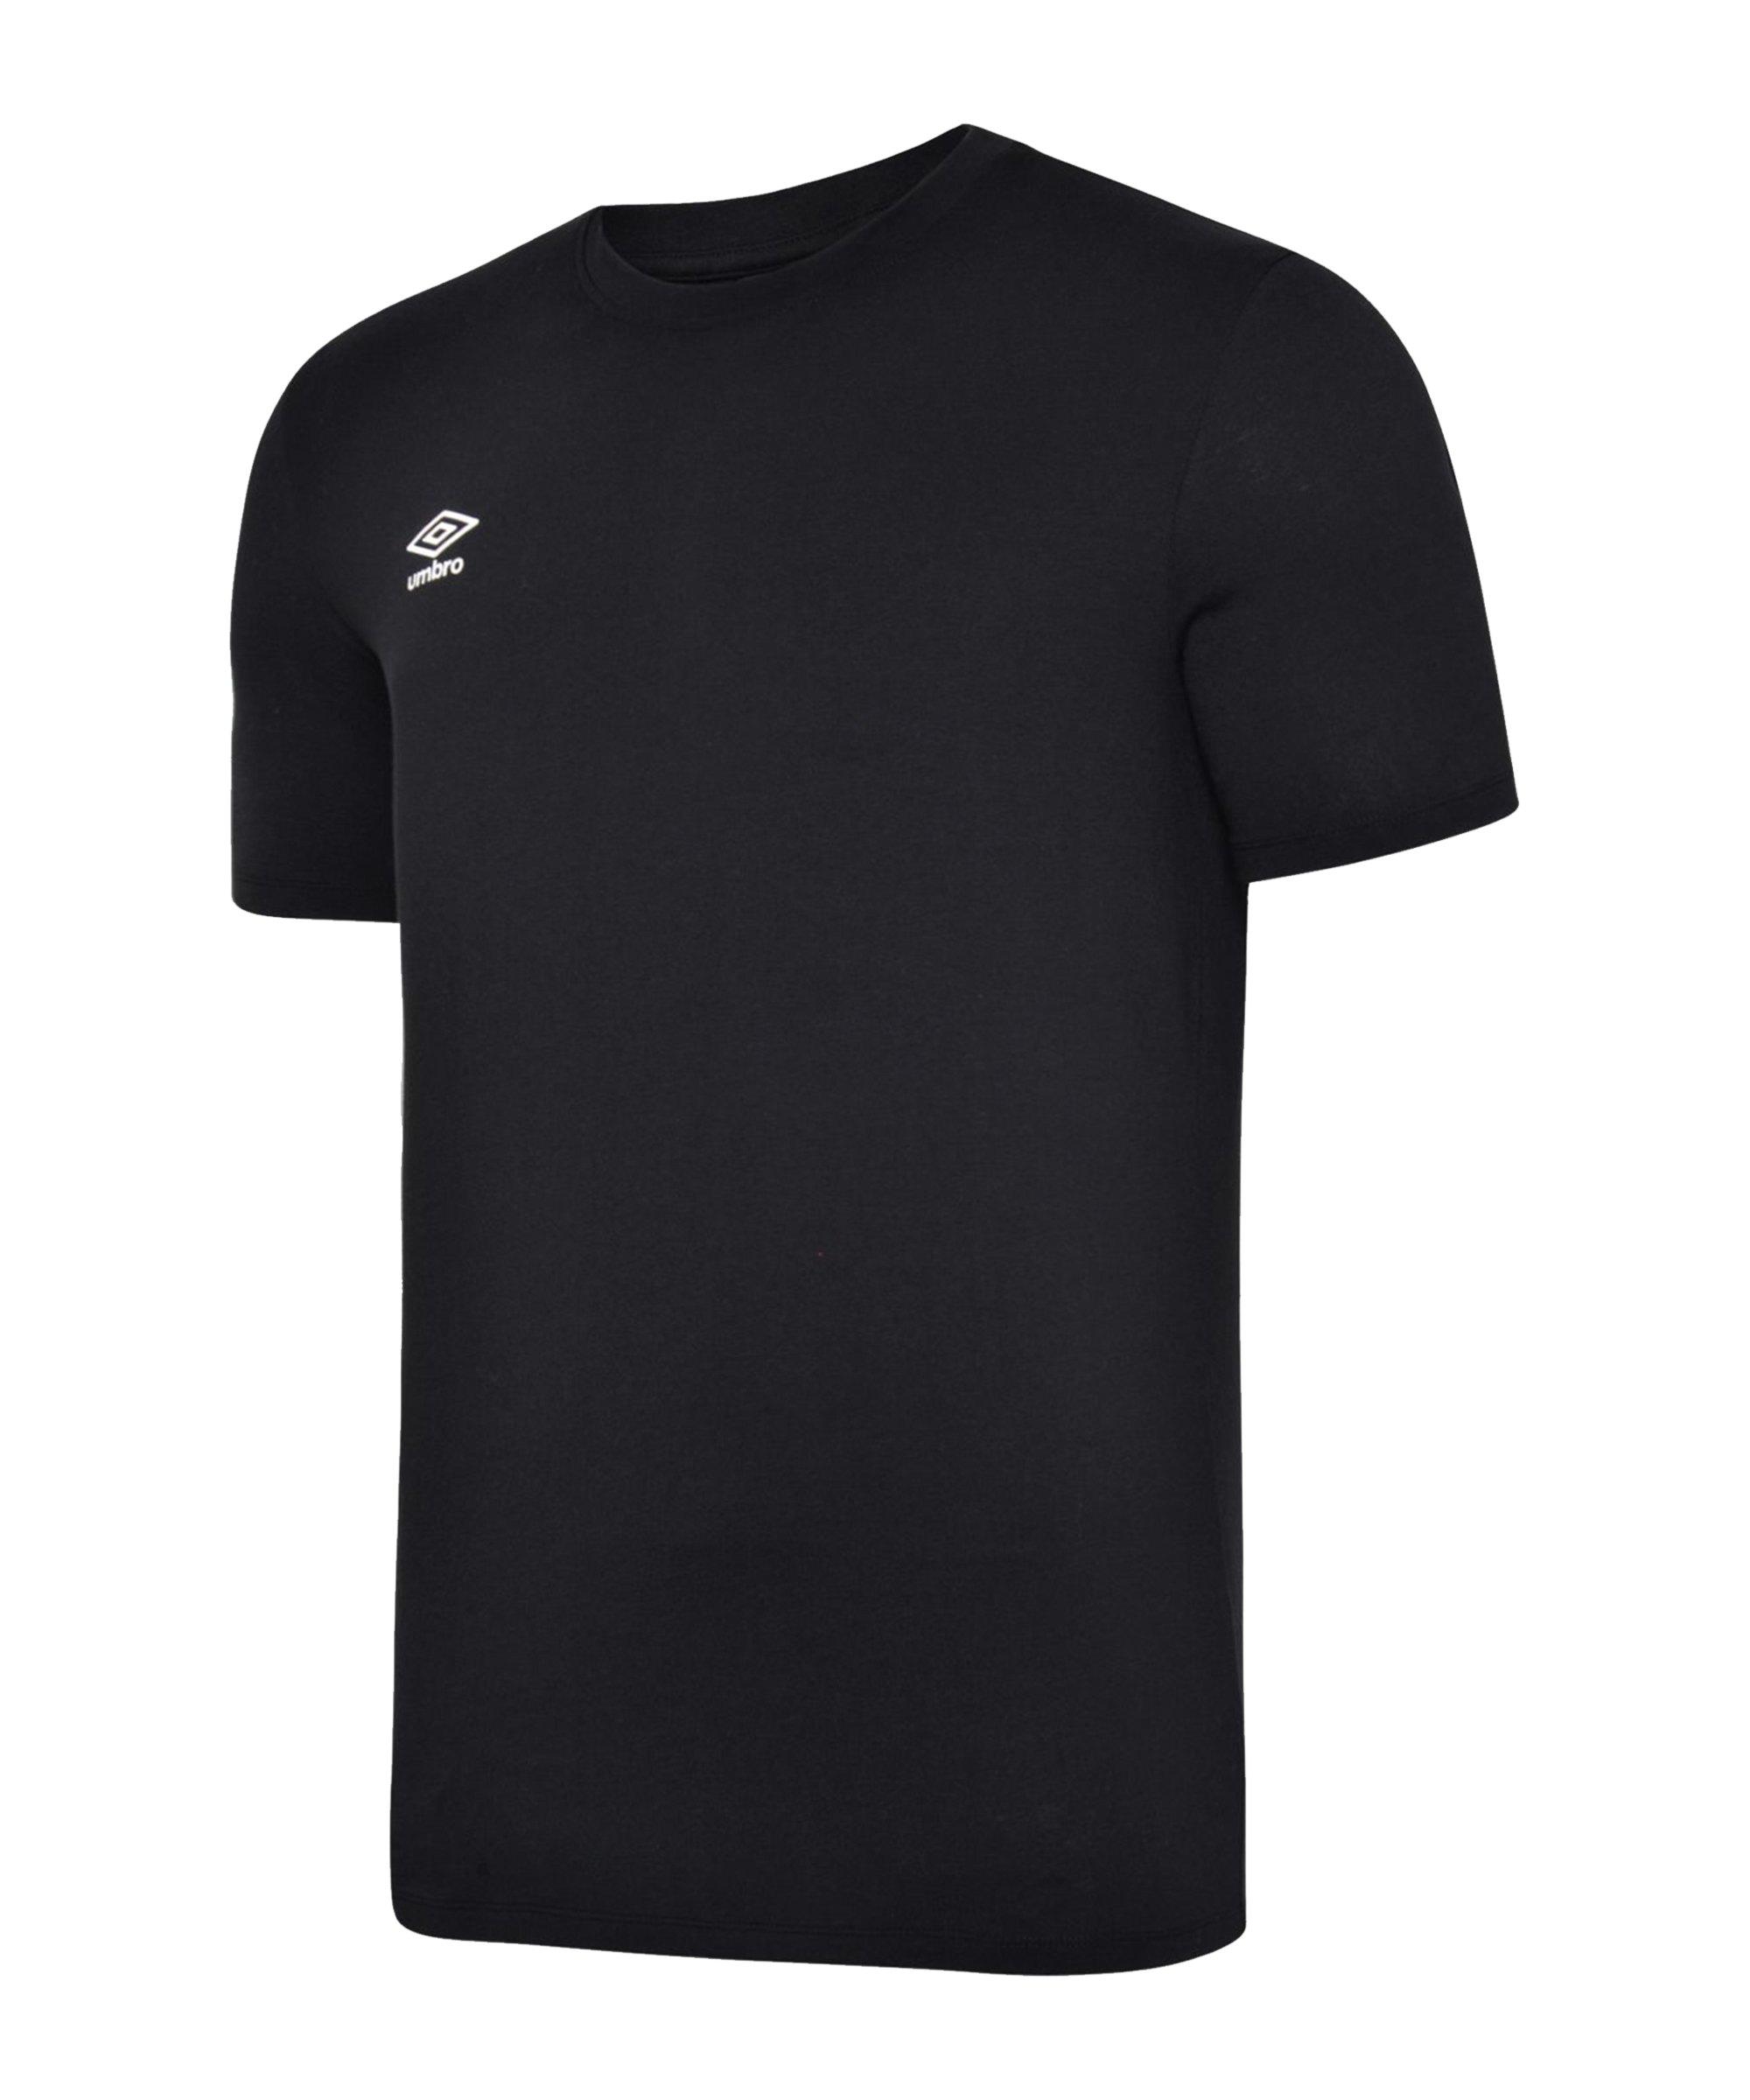 Umbro Club Leisure Crew Tee T-Shirt F090 - schwarz